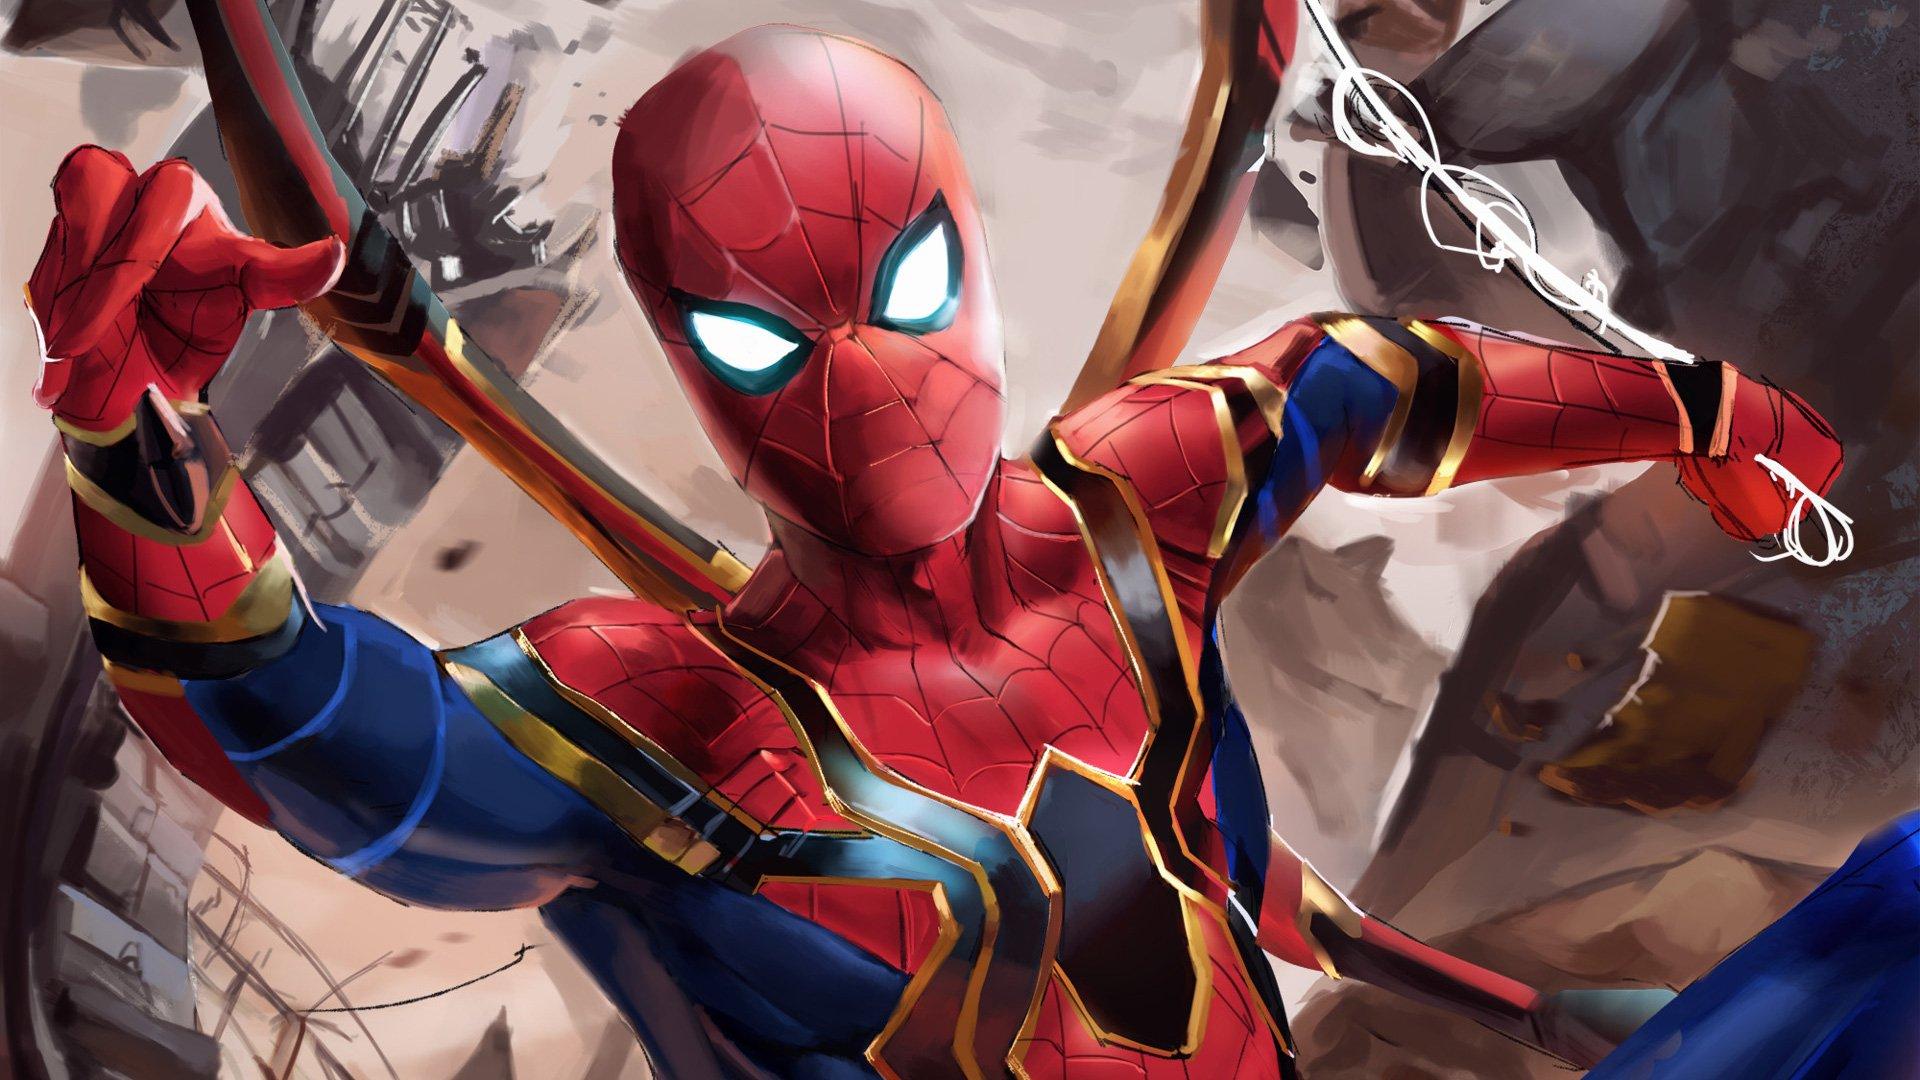 Iron Spider Suit In Avengers Infinity War Hd Wallpaper